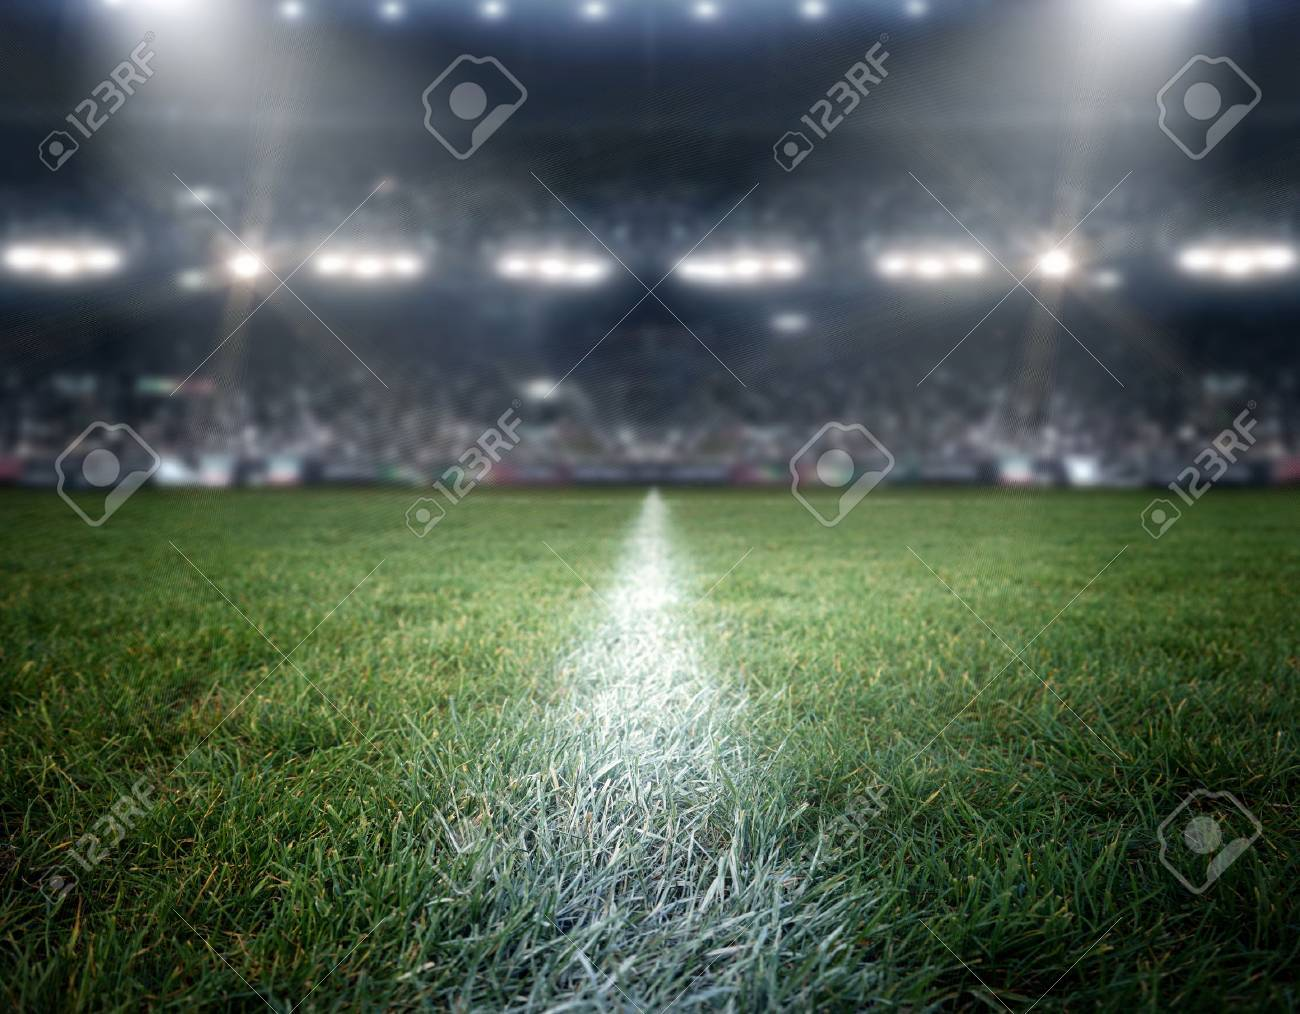 stadium lights, the imaginary stadium is modeled and rendered. - 66776042